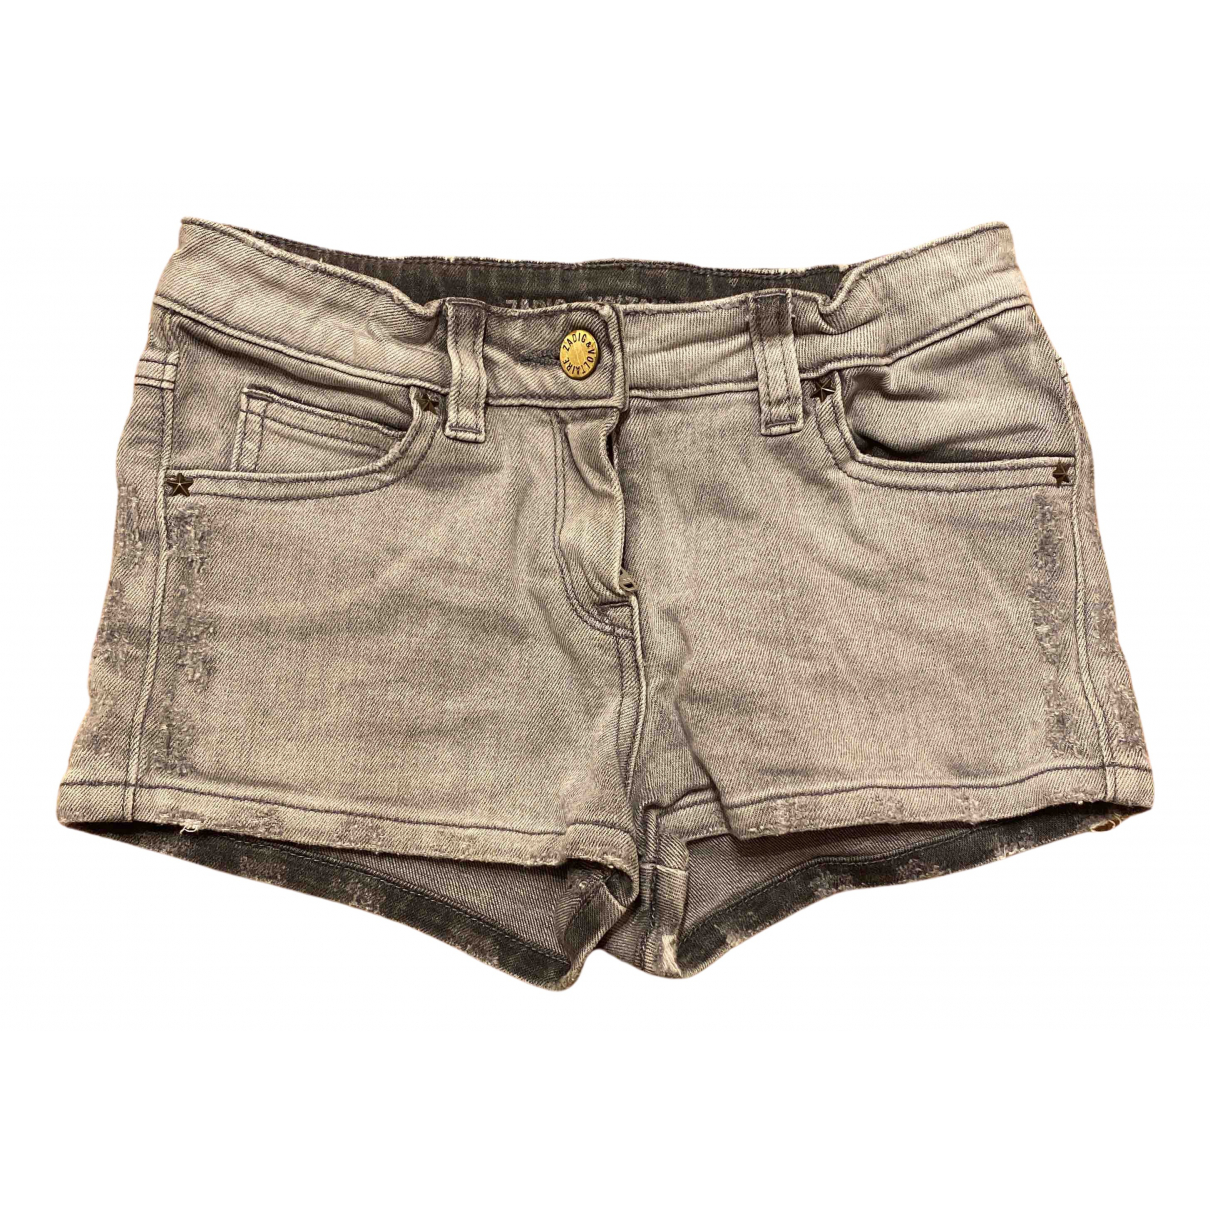 Zadig & Voltaire \N Shorts in  Grau Denim - Jeans